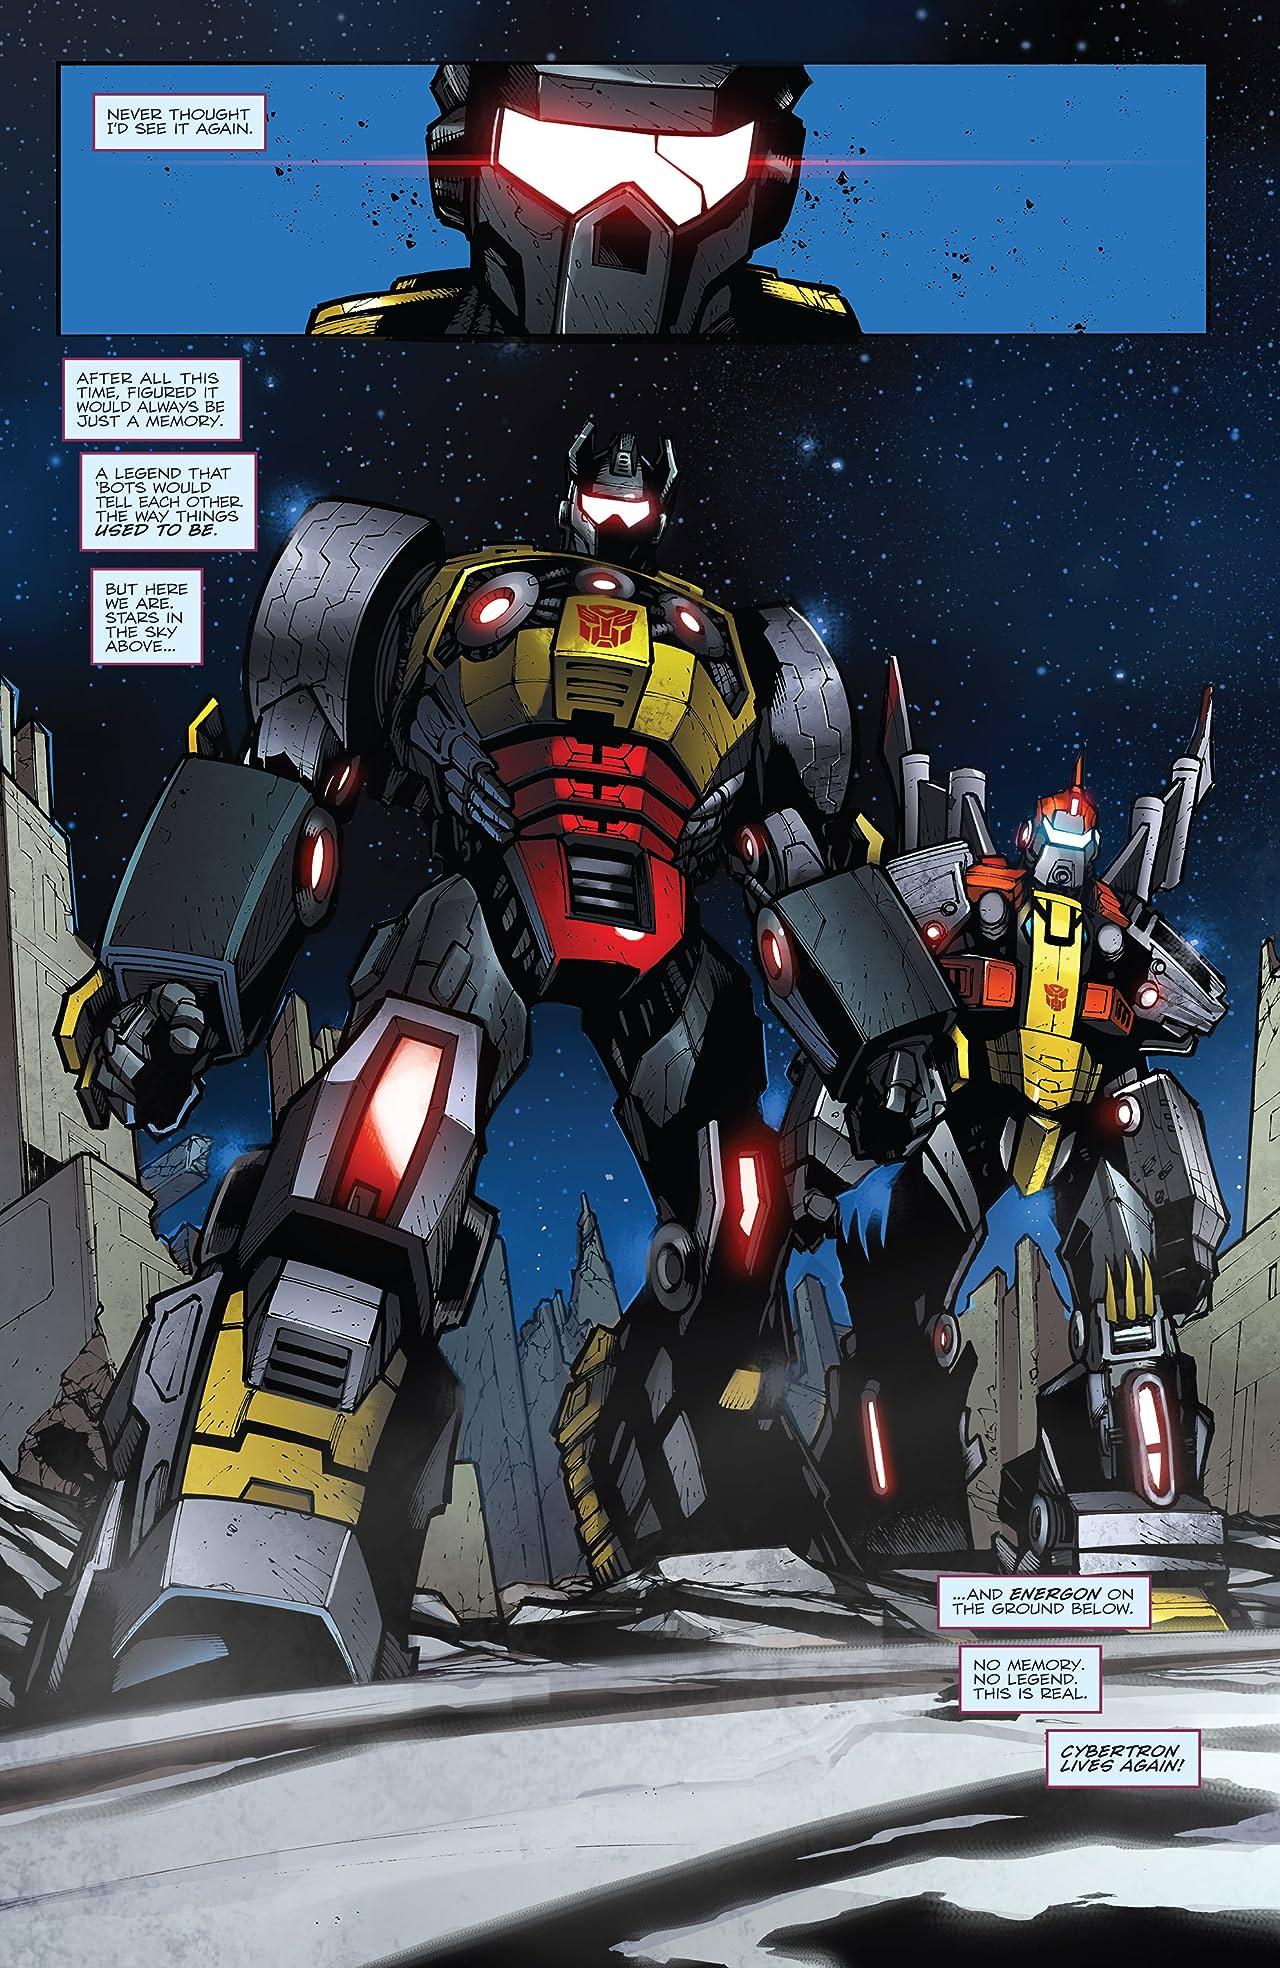 Transformers: Prime - Beast Hunters #7